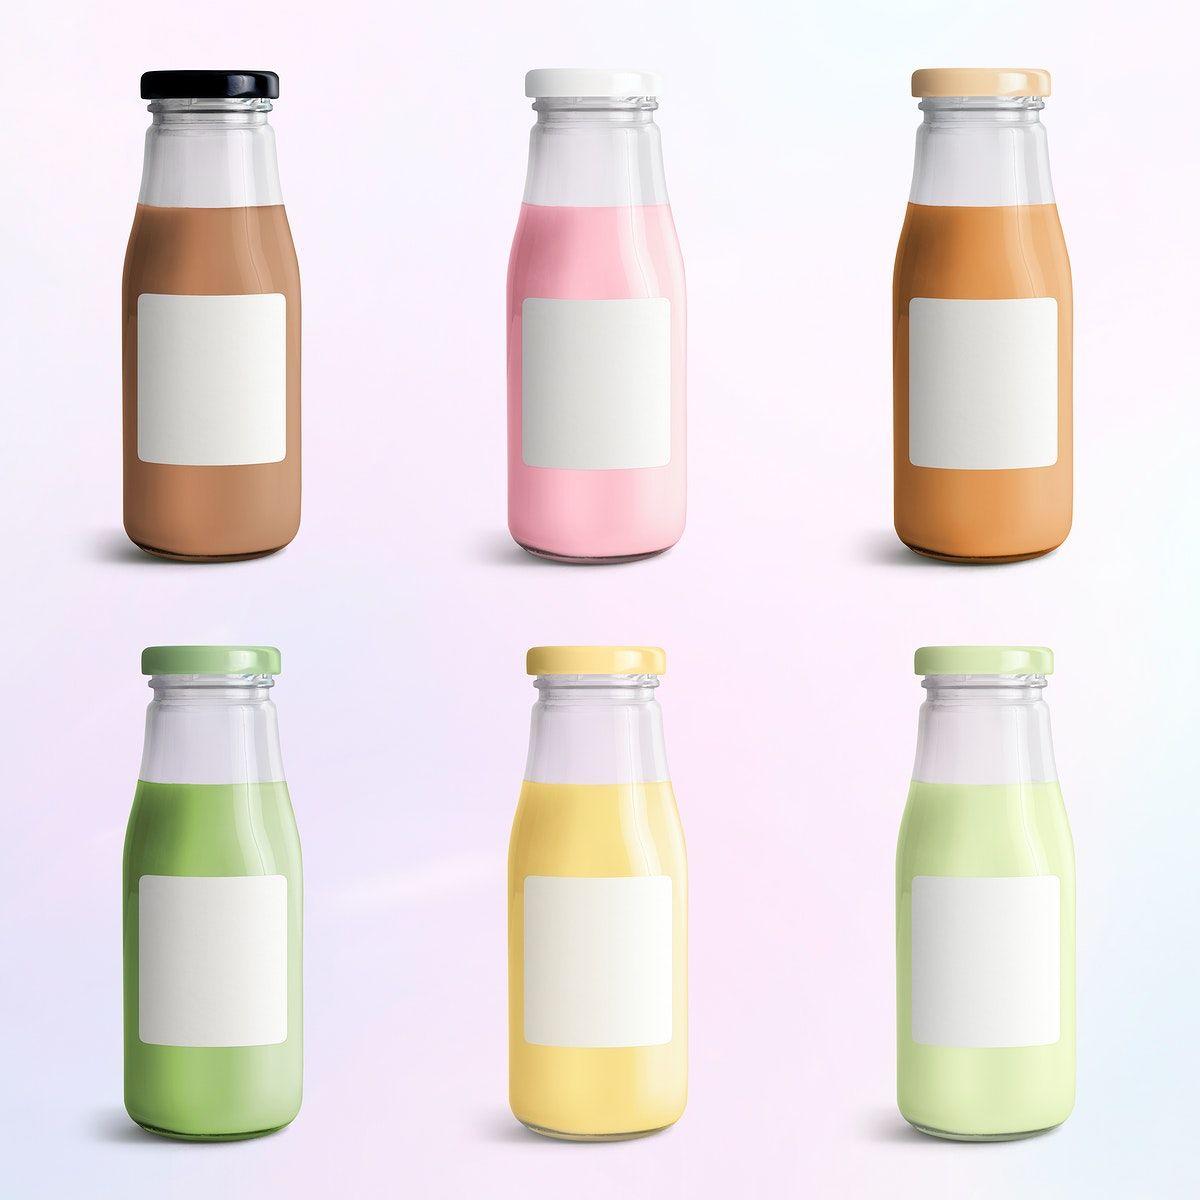 Download Premium Psd Of Colorful Milk Tea In Glass Bottle Mockups 2392082 Milk Tea Bottle Mockup Milk Packaging